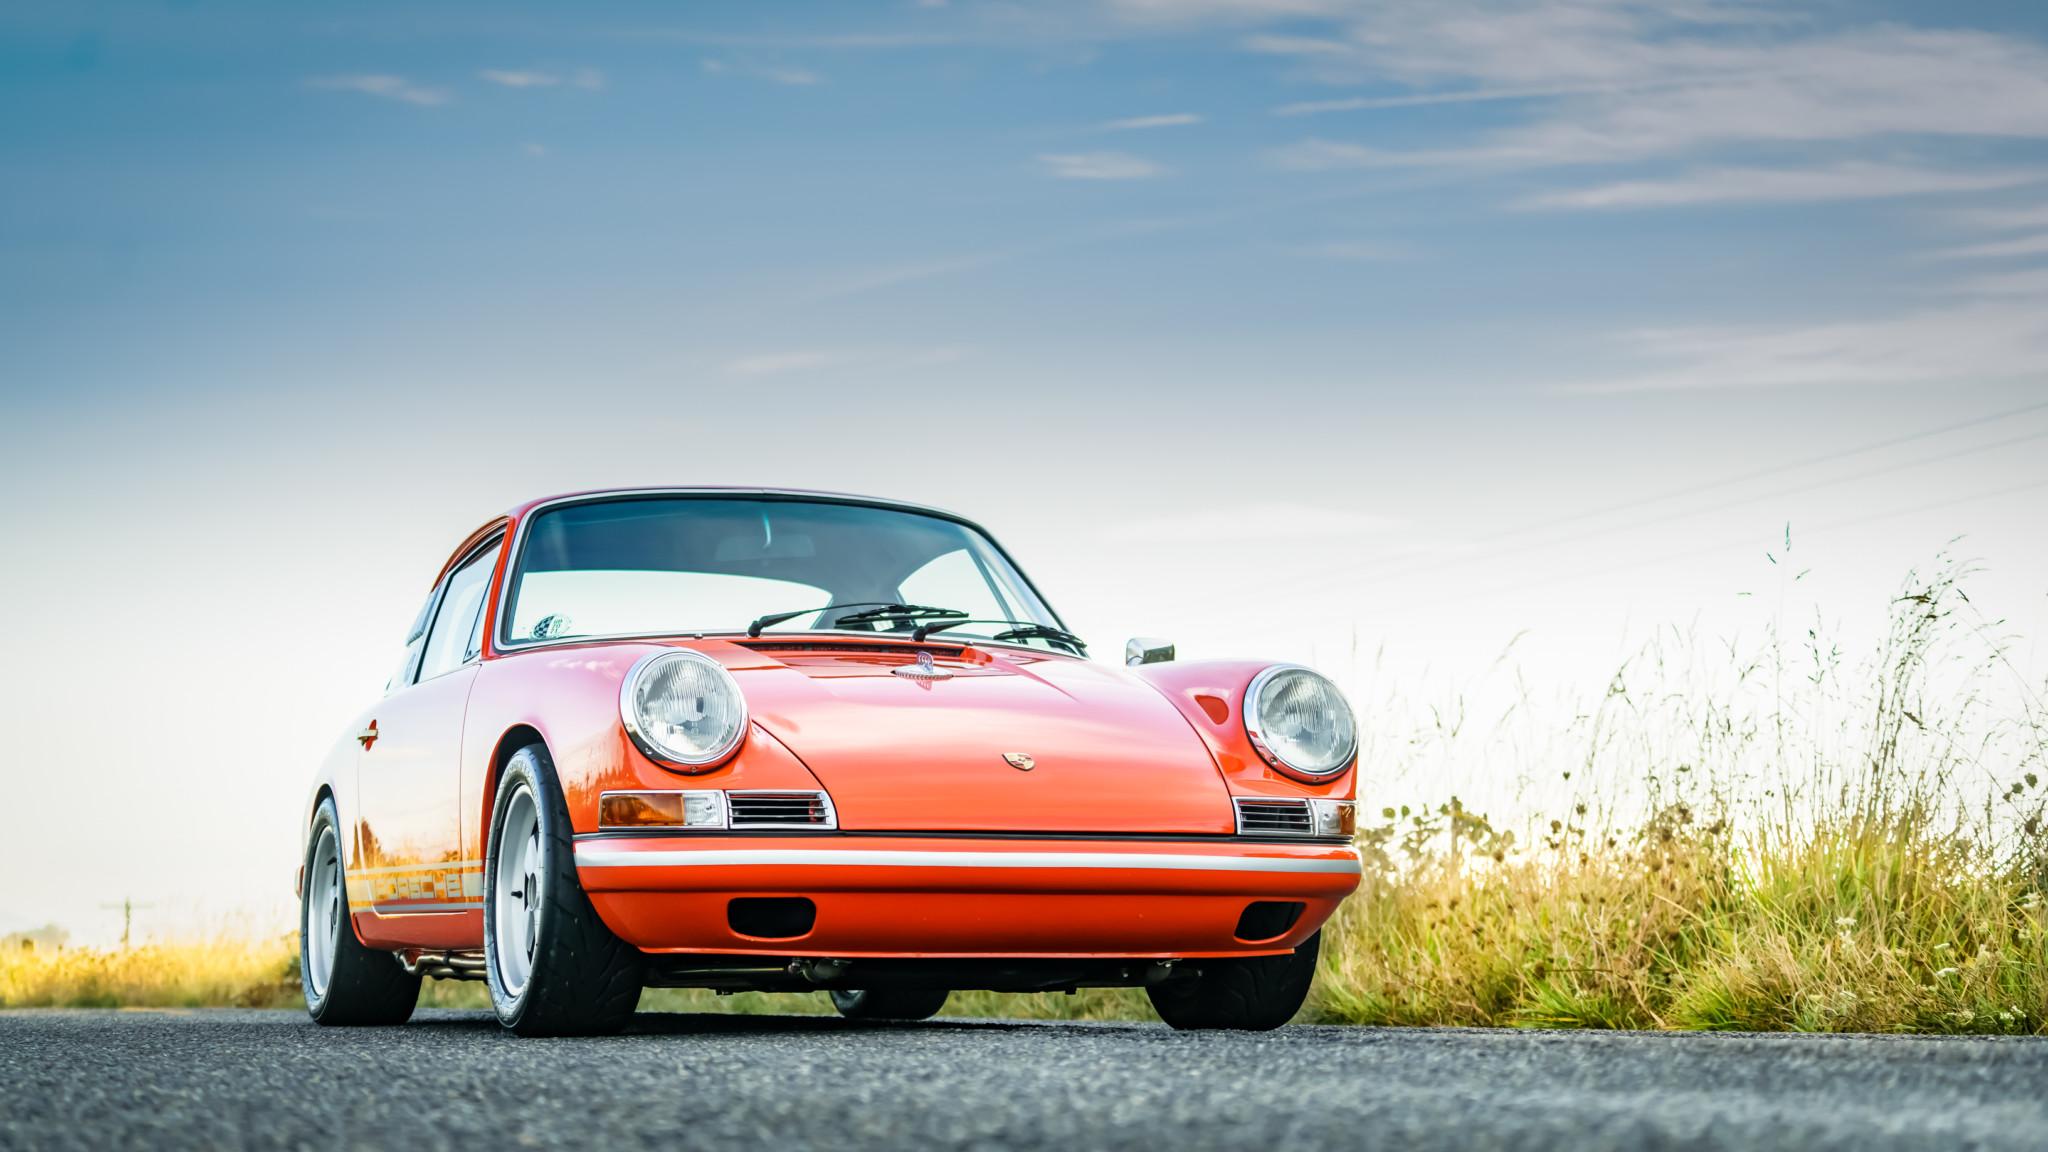 Tuned 1968 Porsche 912 Papel De Parede Hd Plano De Fundo 2048x1152 Id 1017280 Wallpaper Abyss